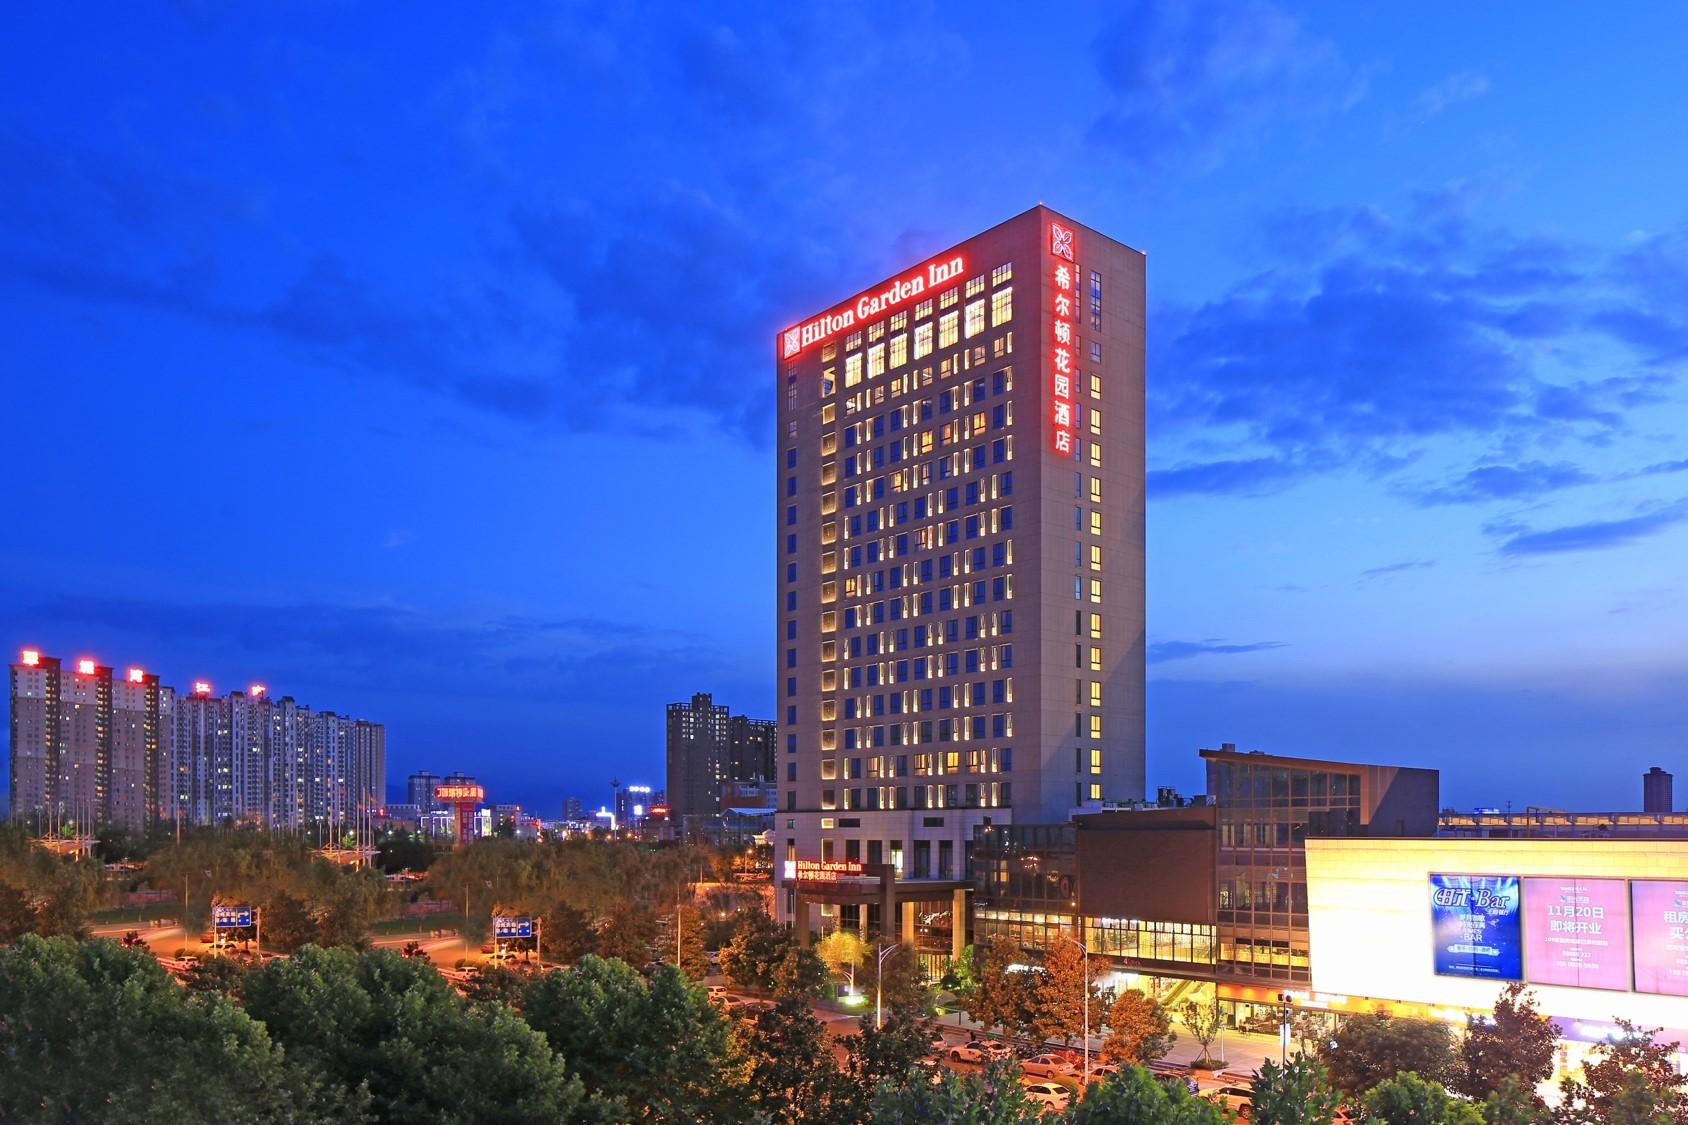 More About Hilton Garden Inn Xiu0027an High Tech Zone